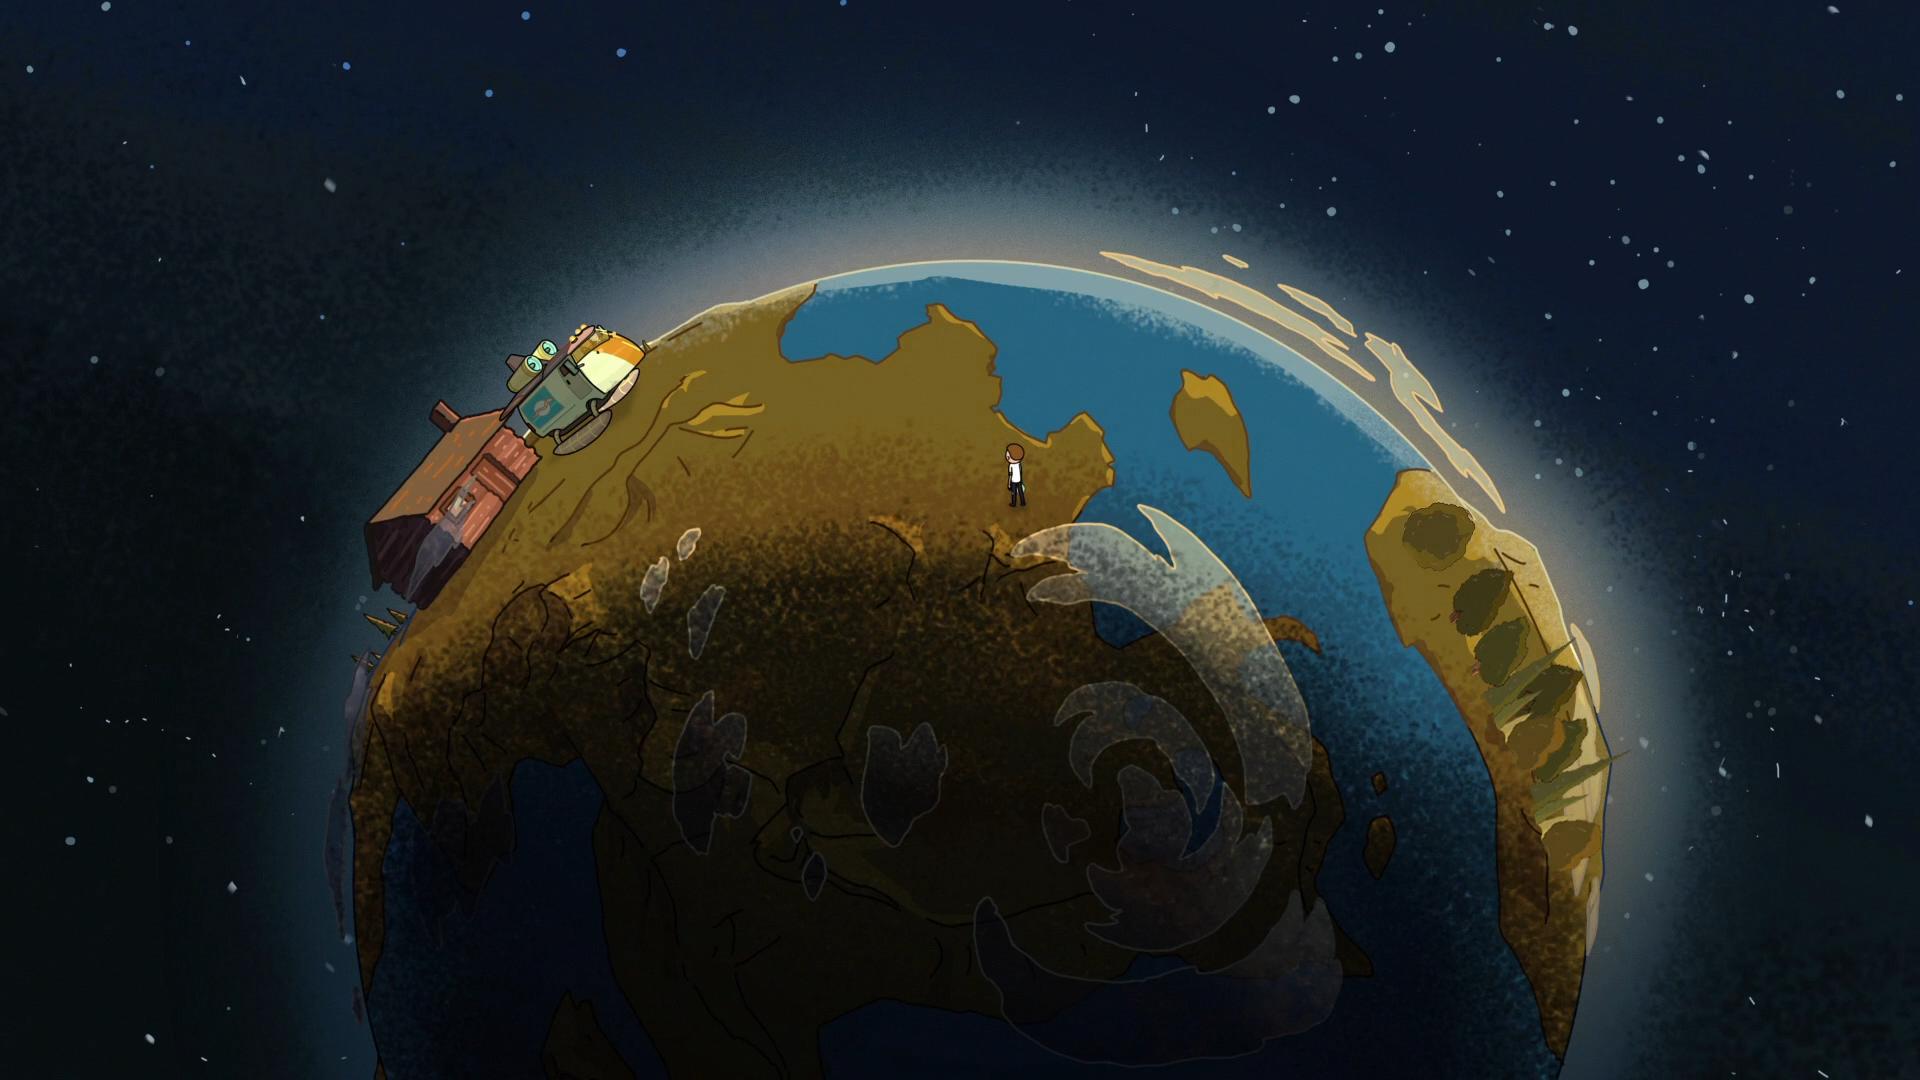 Fond D Ecran Illustration Planete Espace Terre Dessin Anime